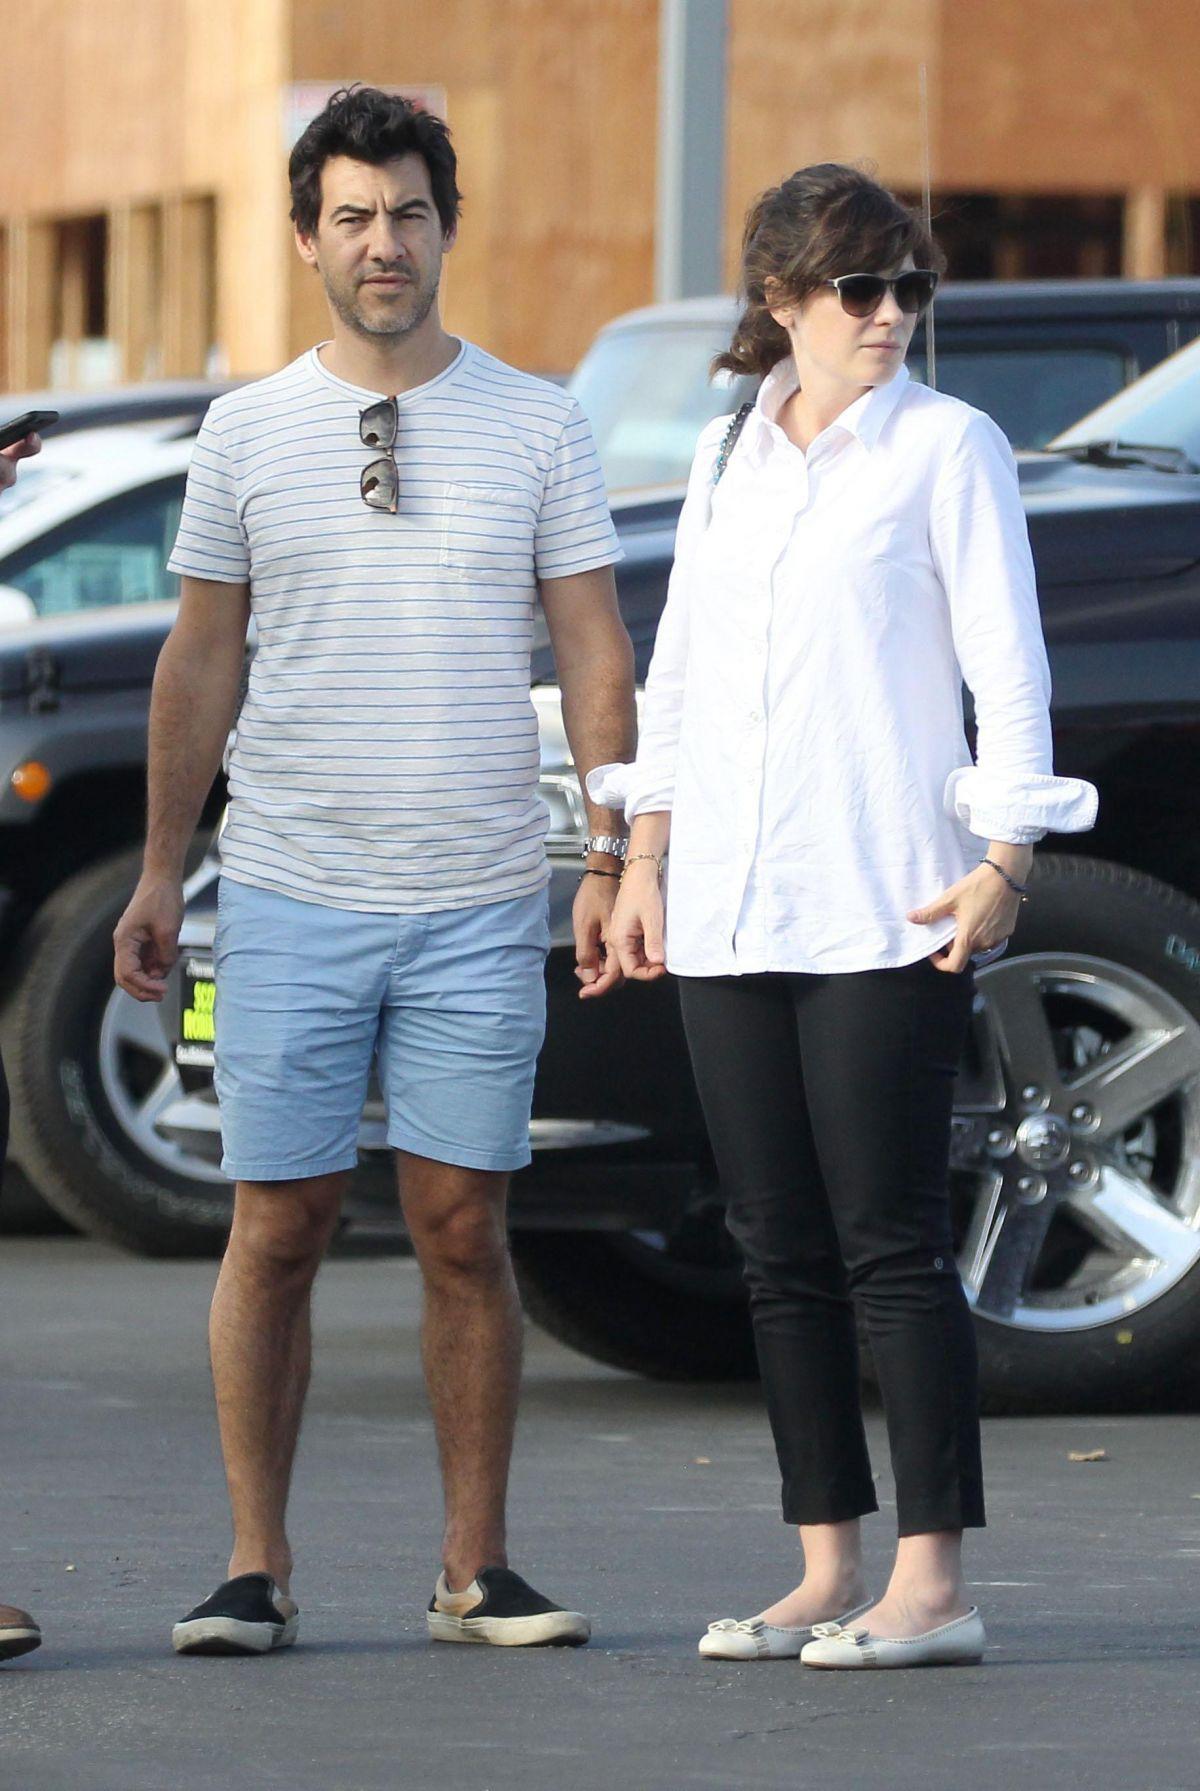 ZOEY DESCHANEL and Her Husband Jacob Pechenik Shopping for ...